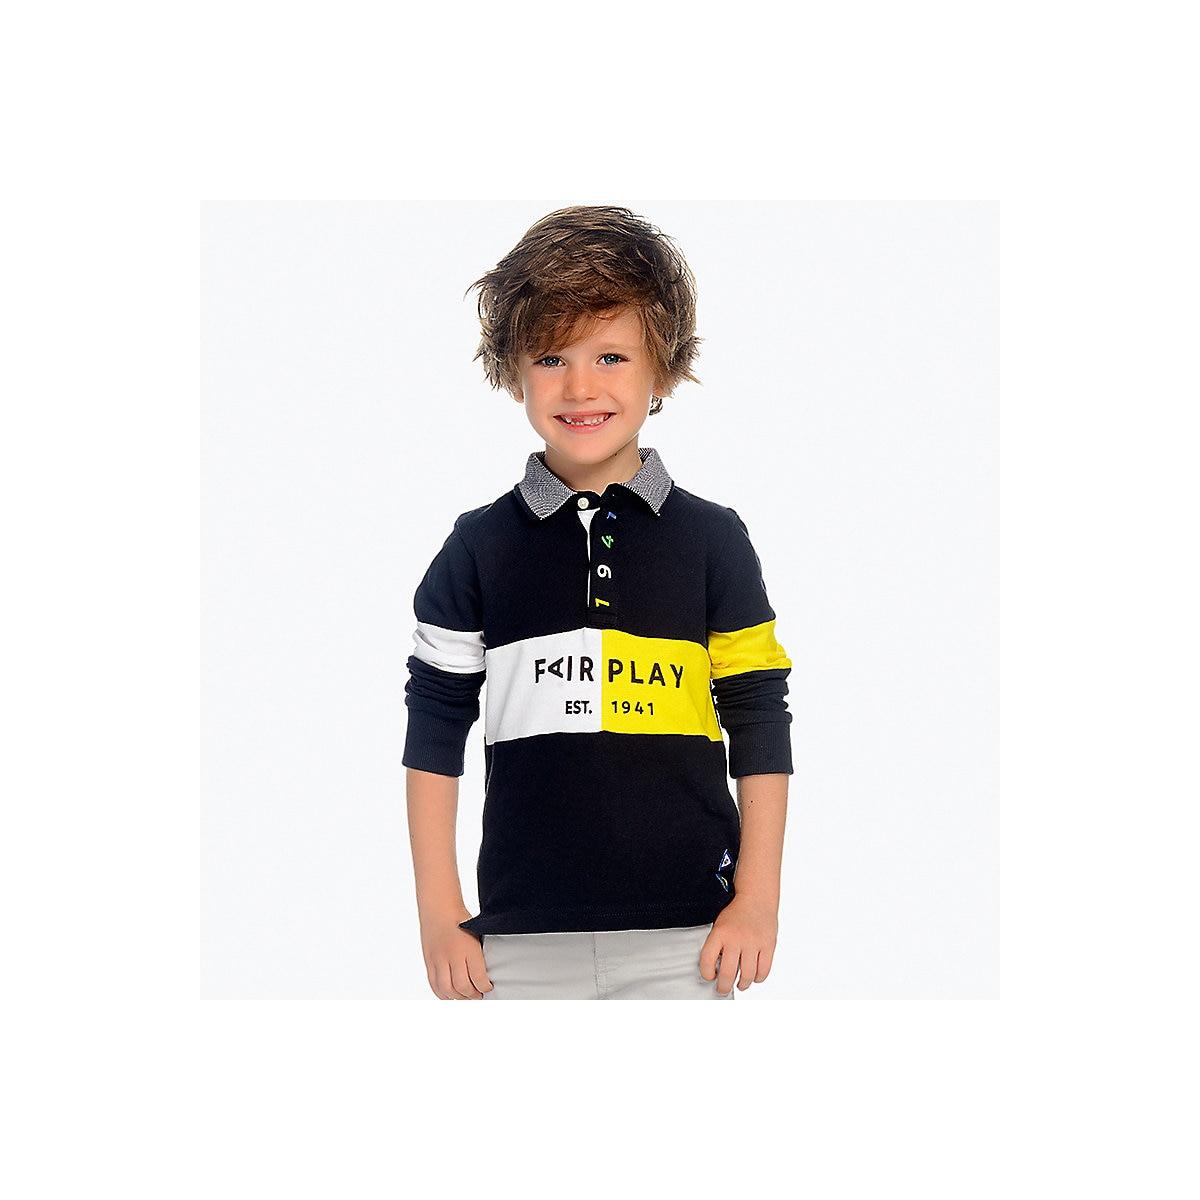 MAYORAL Polo Shirts 10687226 children clothing t-shirt shirt the print for boys